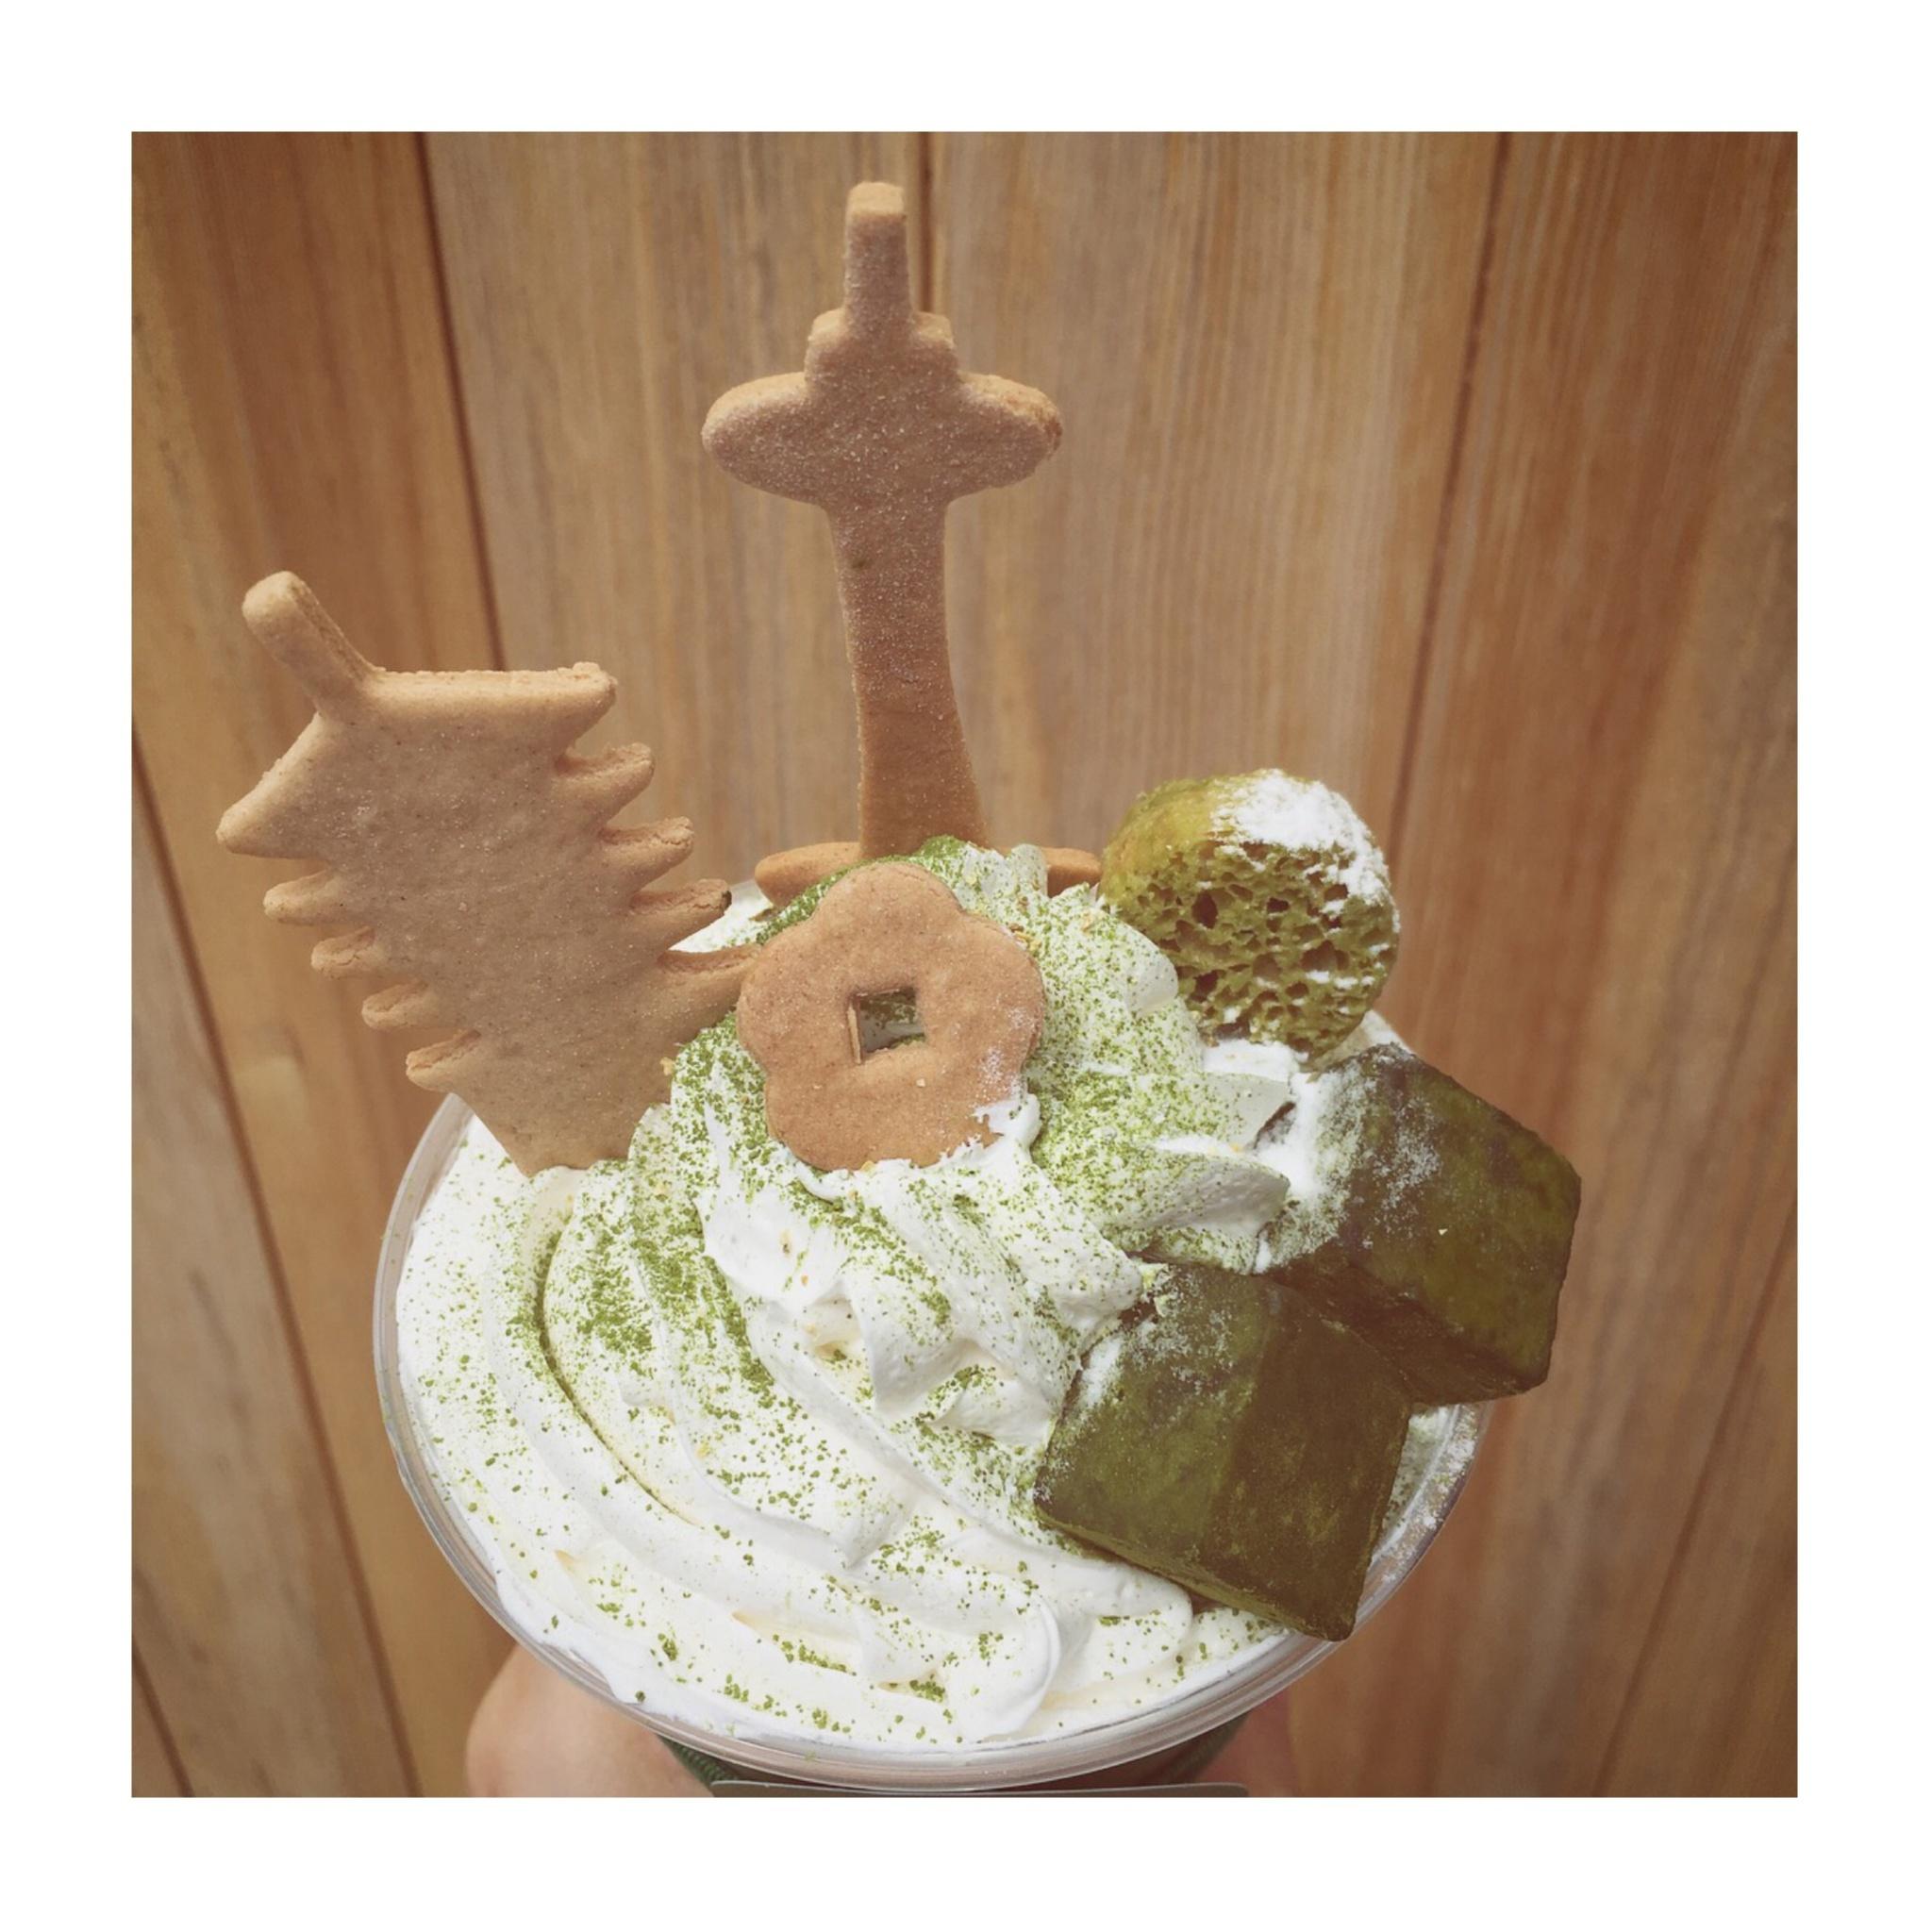 #5【#cafestagram】❤️:《京都》に行ったら絶対飲みたい!ROCCA&FRIENDS TRUCKの抹茶ラテがかわいすぎる◡̈_7